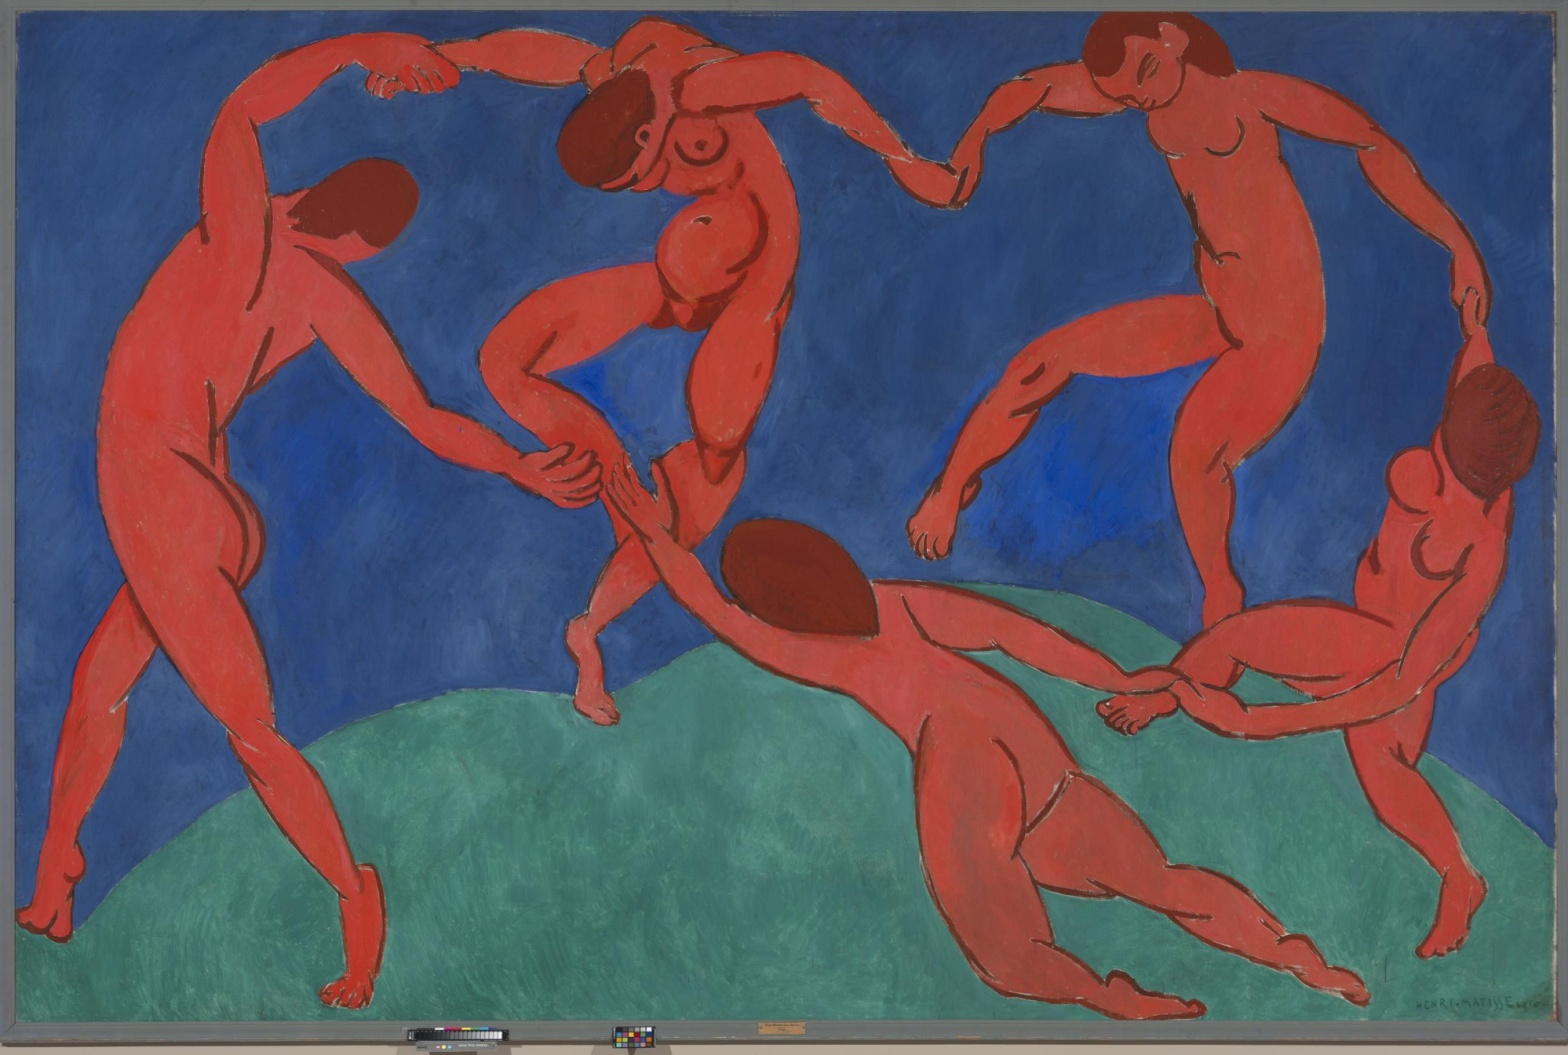 Matisse, Henri. 1869-1954, Dance